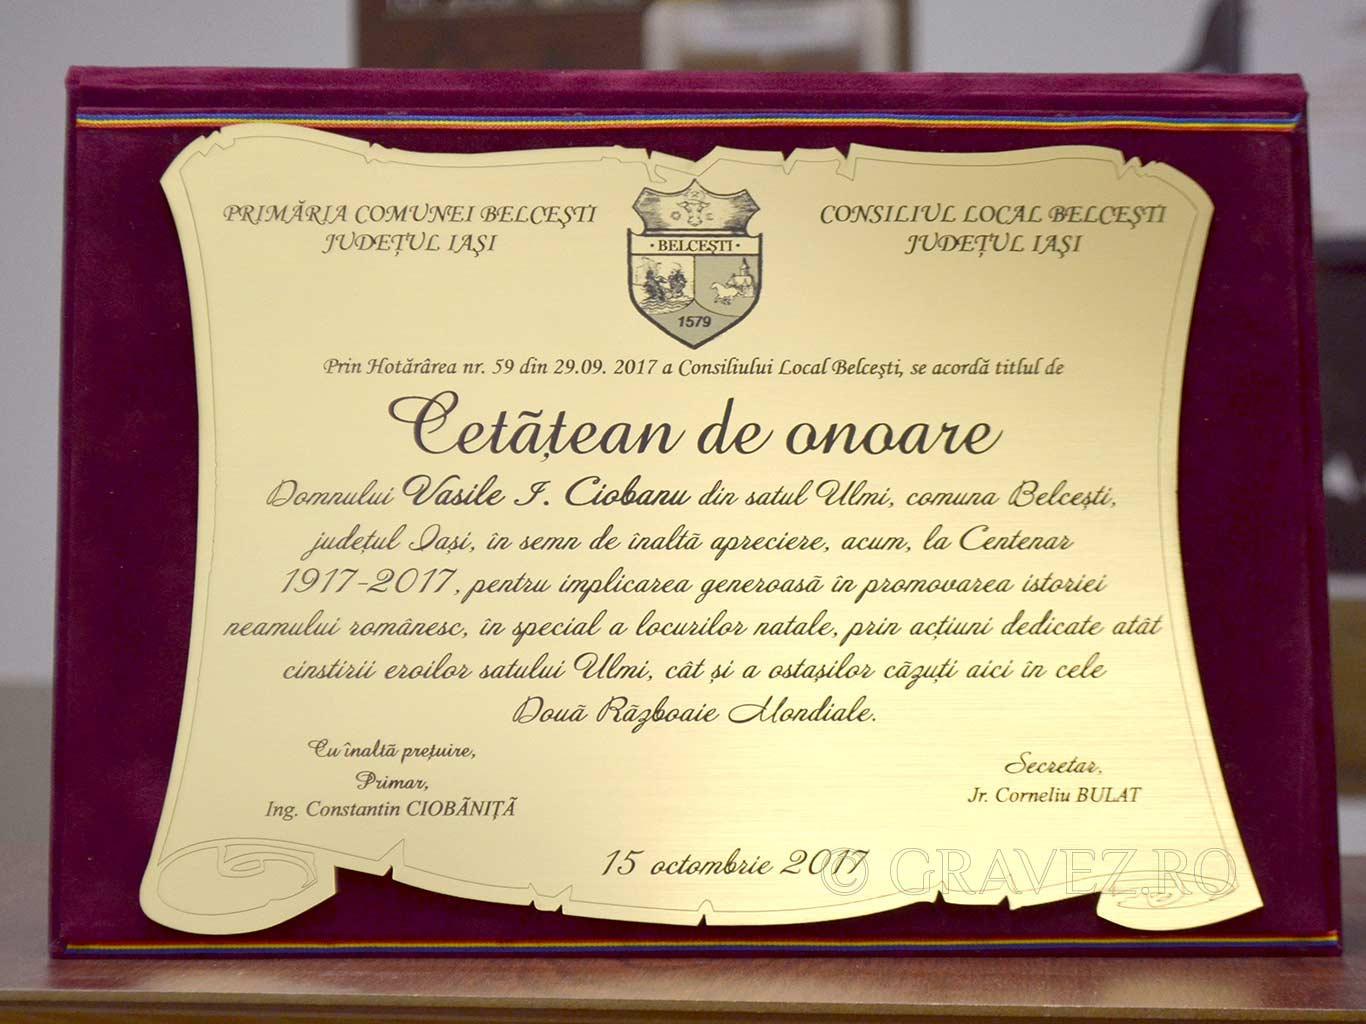 placheta cetatean de onoare cu gravura in metalex auriu in mapa plusata rosie